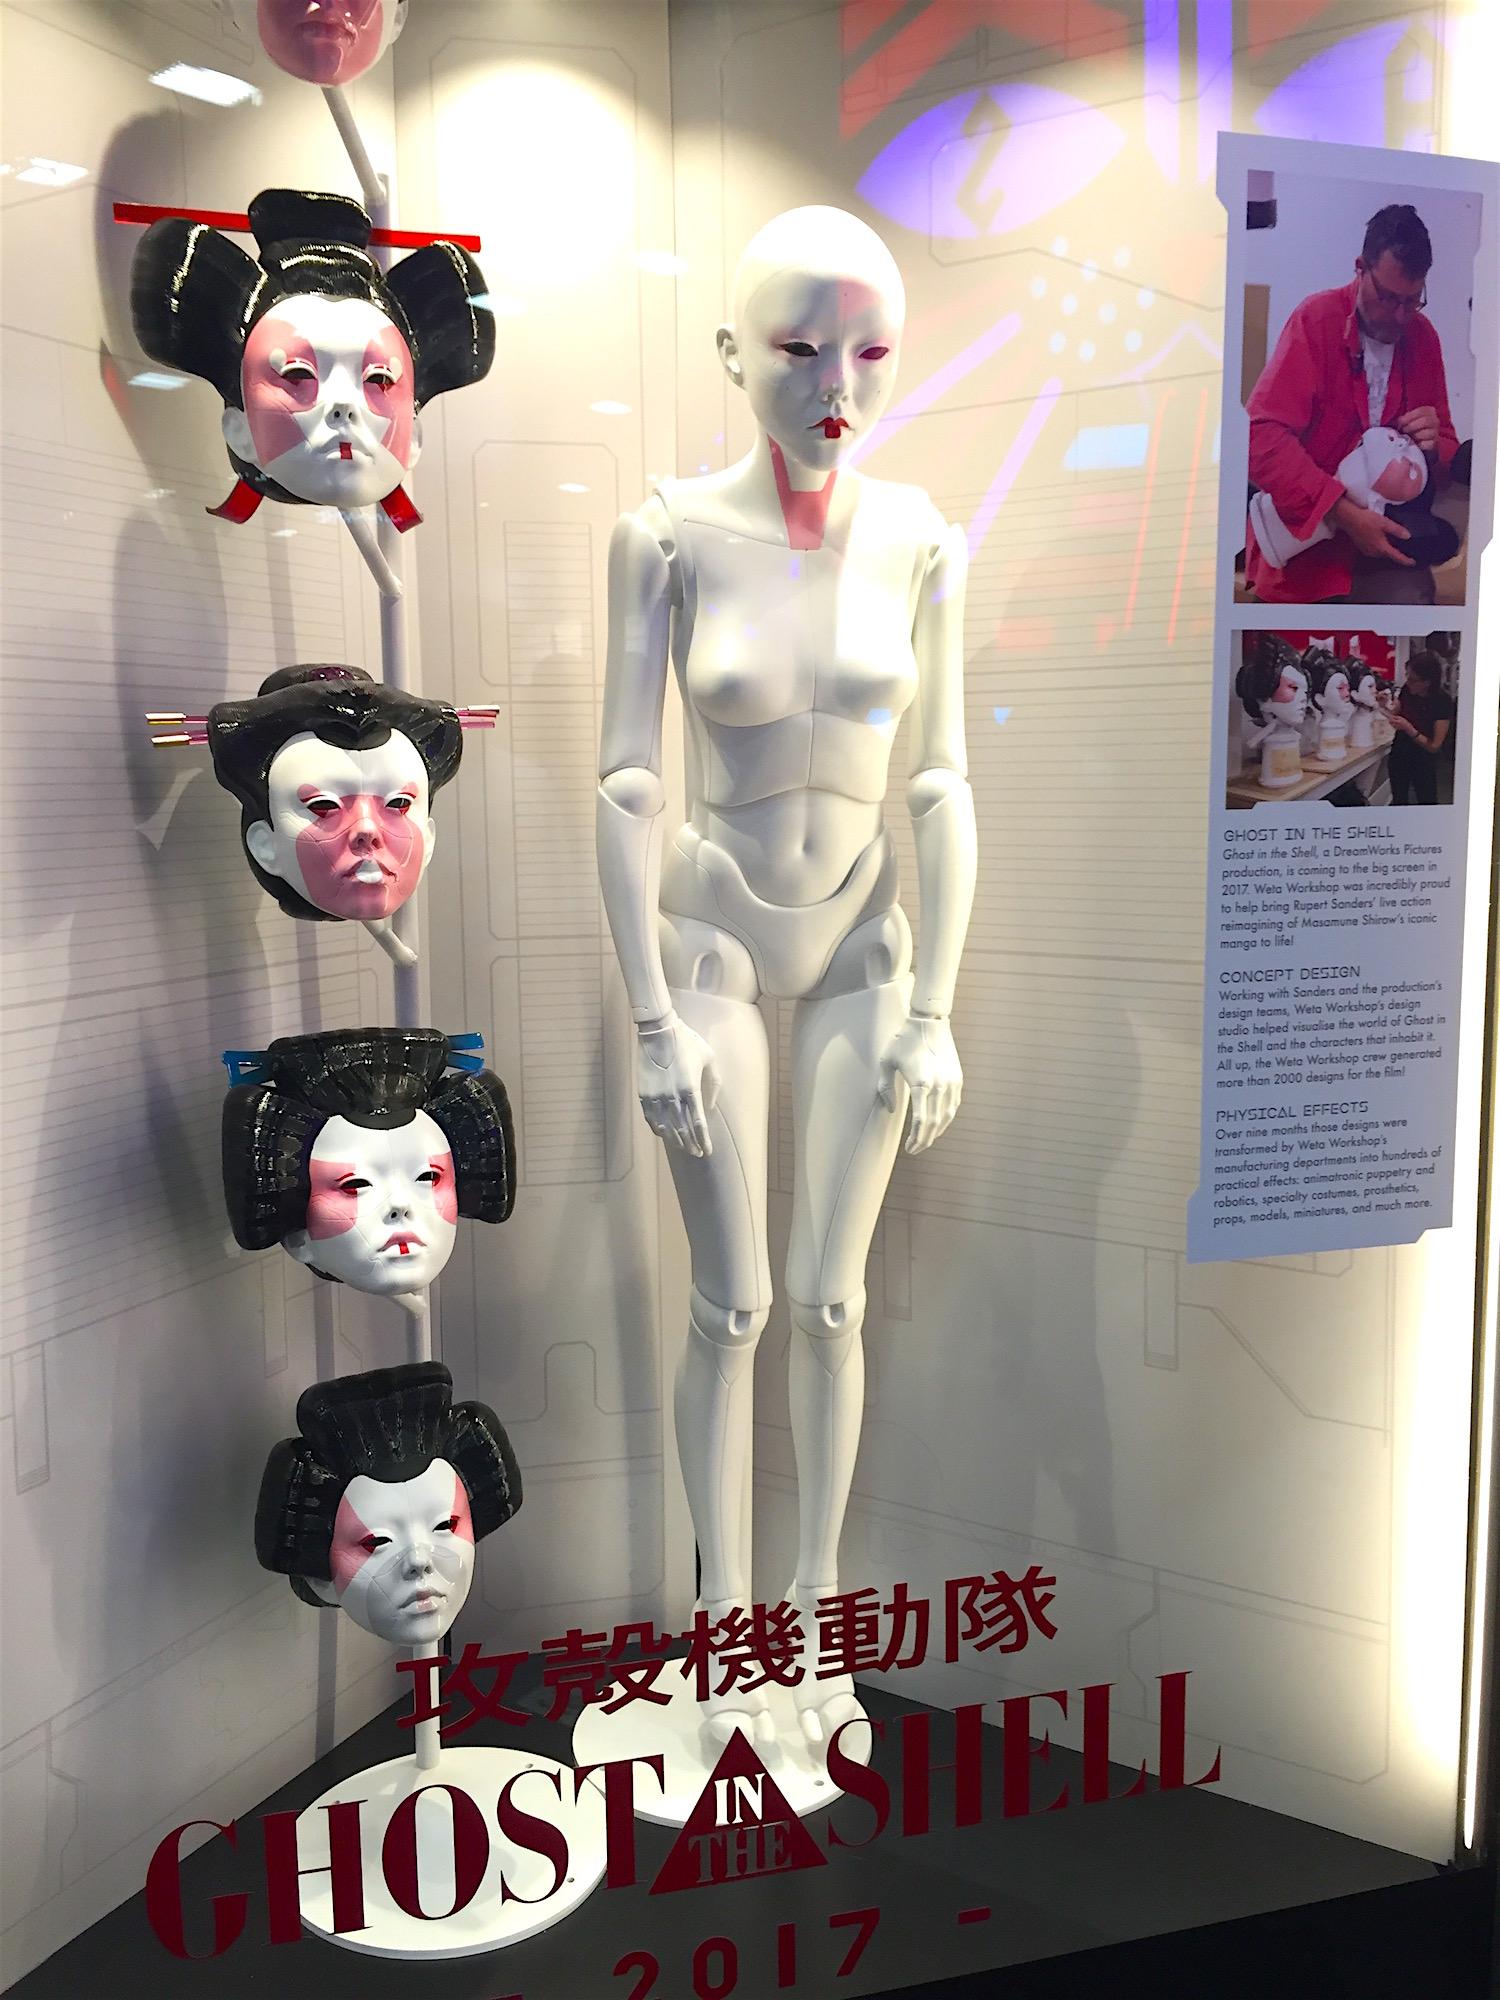 Ghost in the Shell movie 2017 echter Geisha Deluxe anzug faschingskostüme kaufen full body